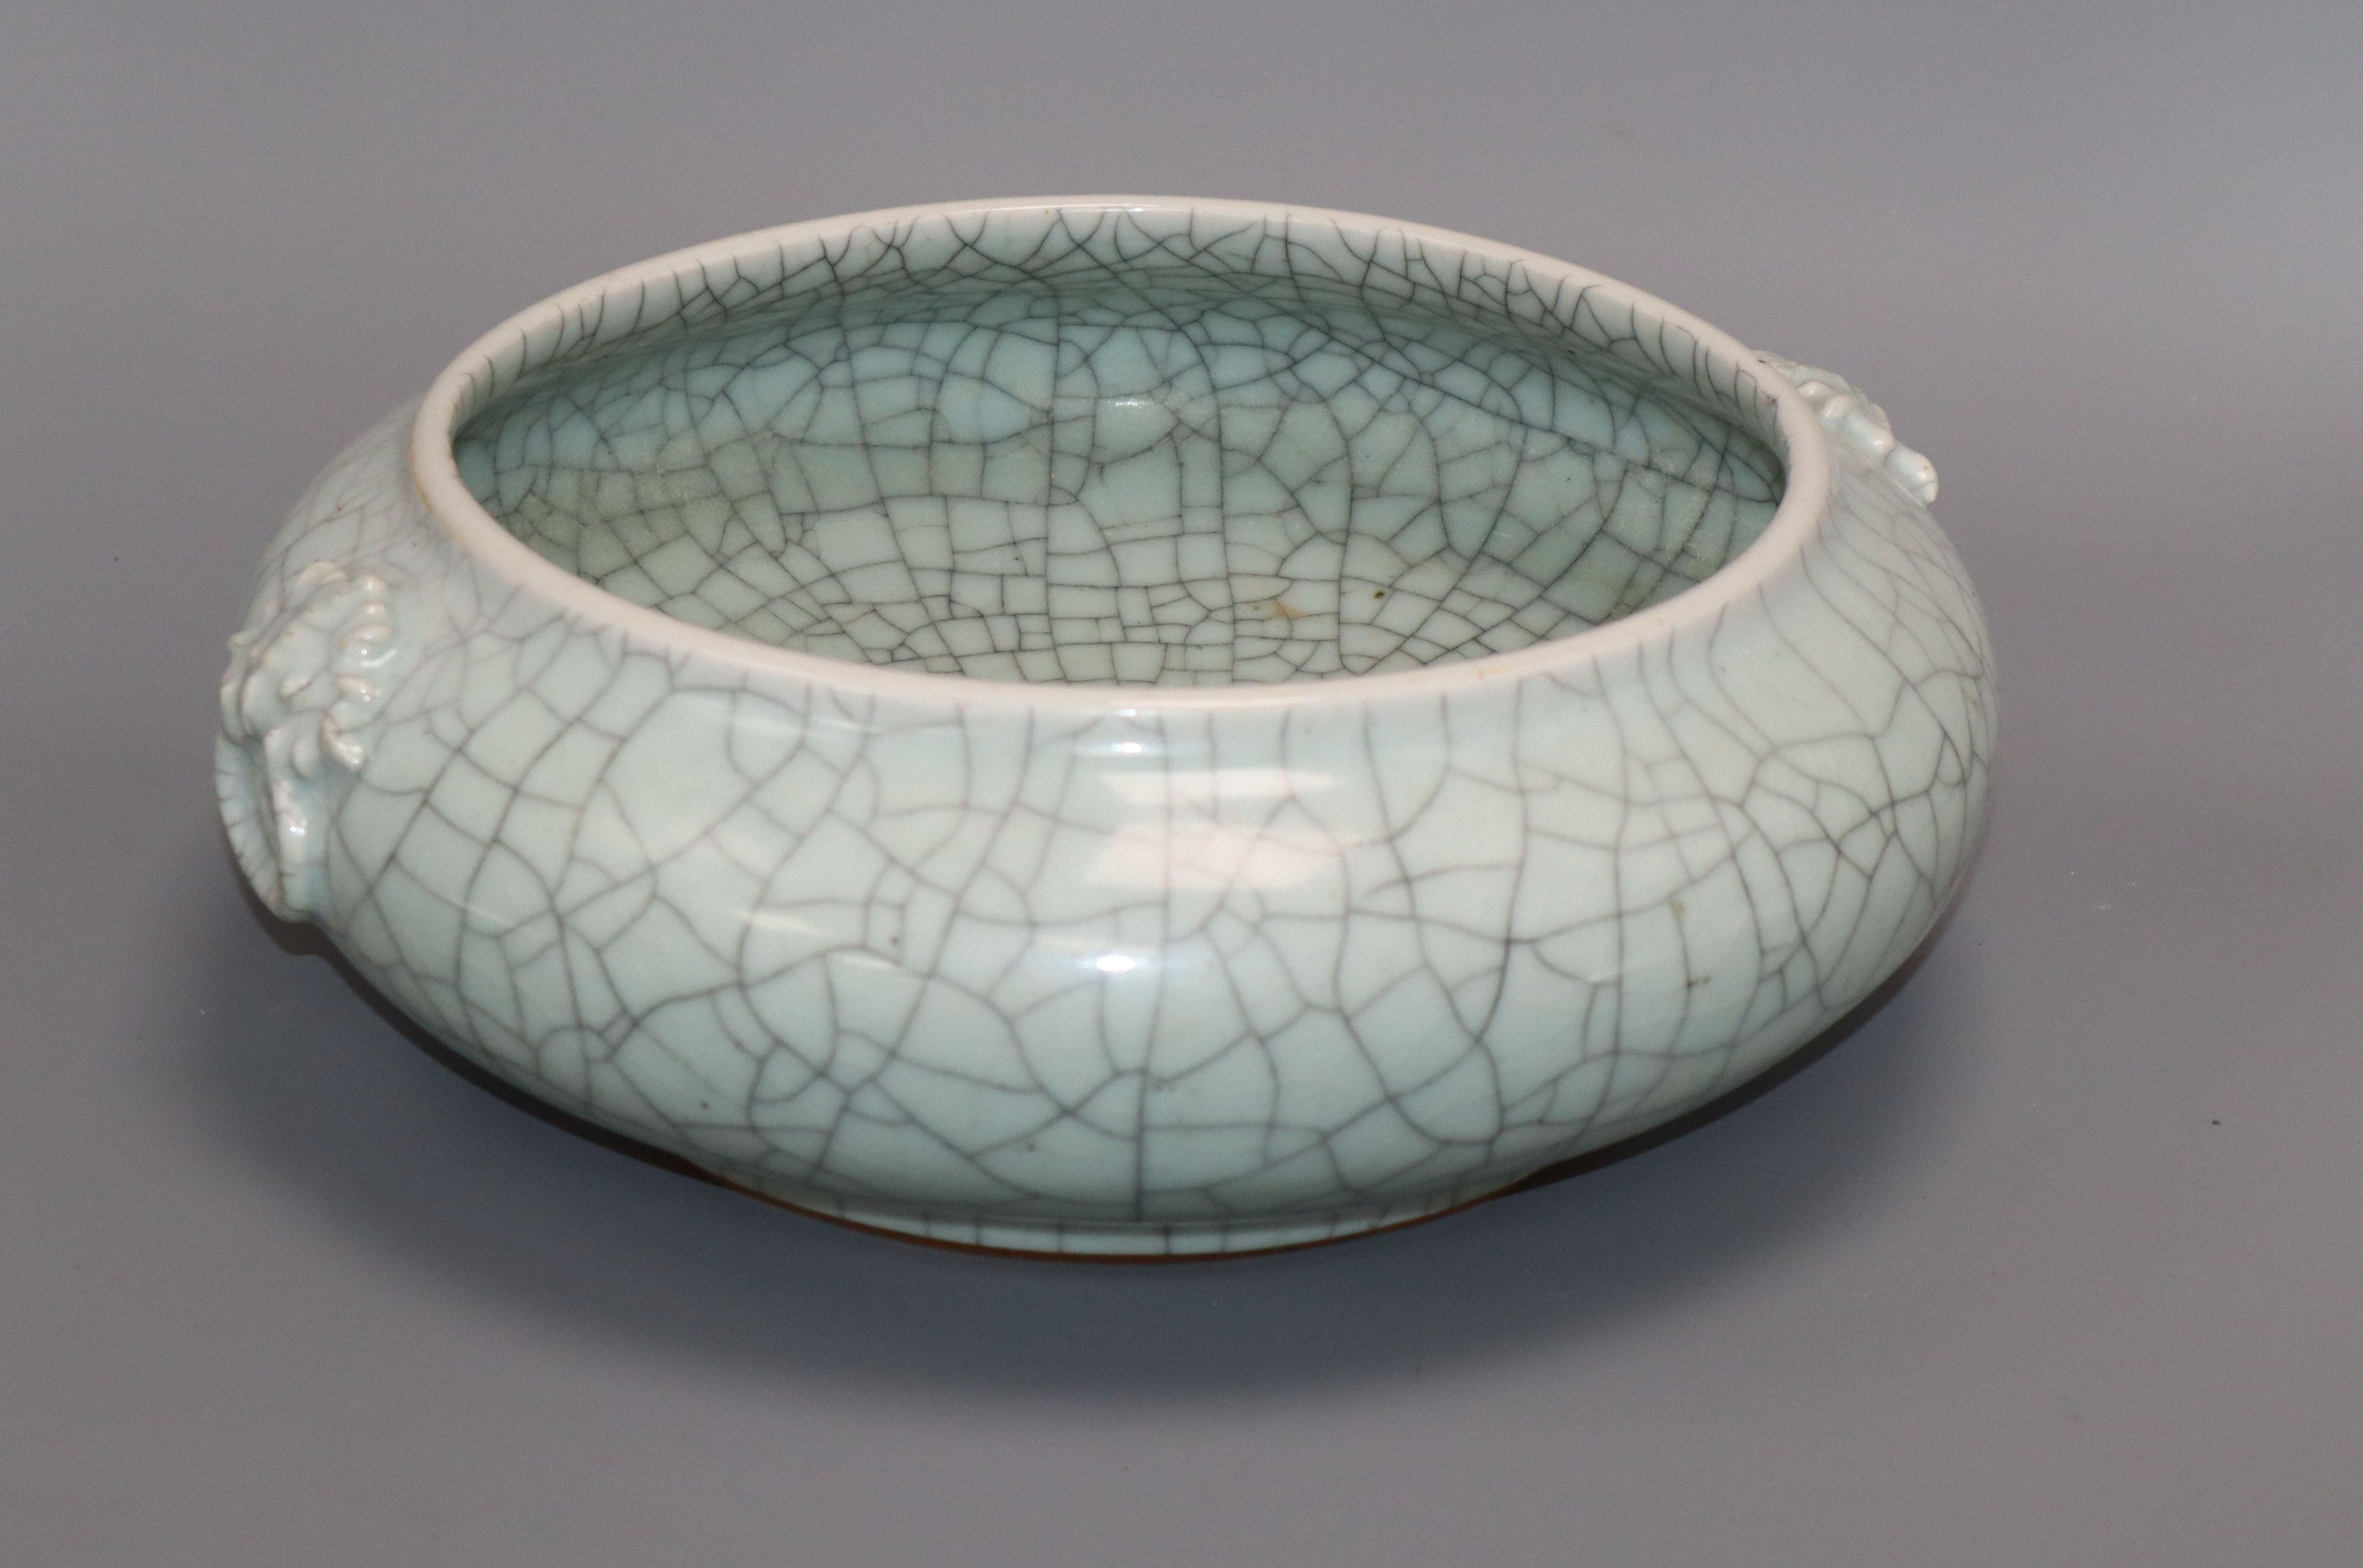 Lot 32 - A large Chinese celadon crackle glaze censer height 11cm